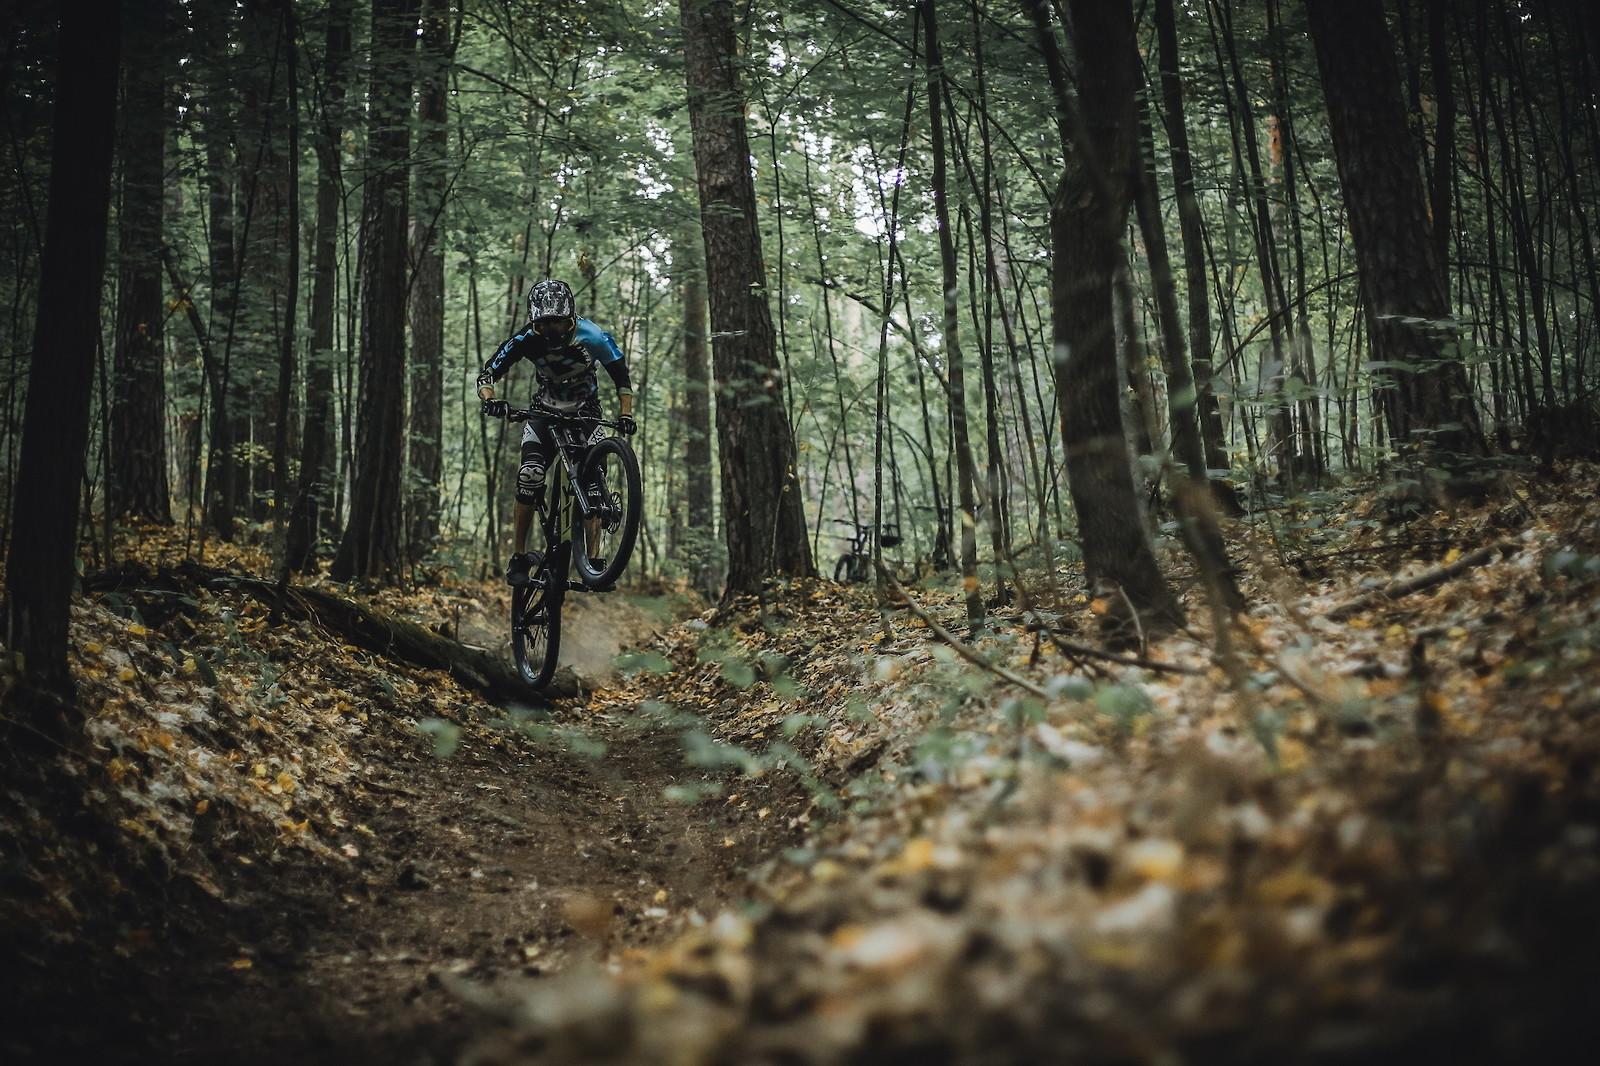 blackside - YakuT - Mountain Biking Pictures - Vital MTB